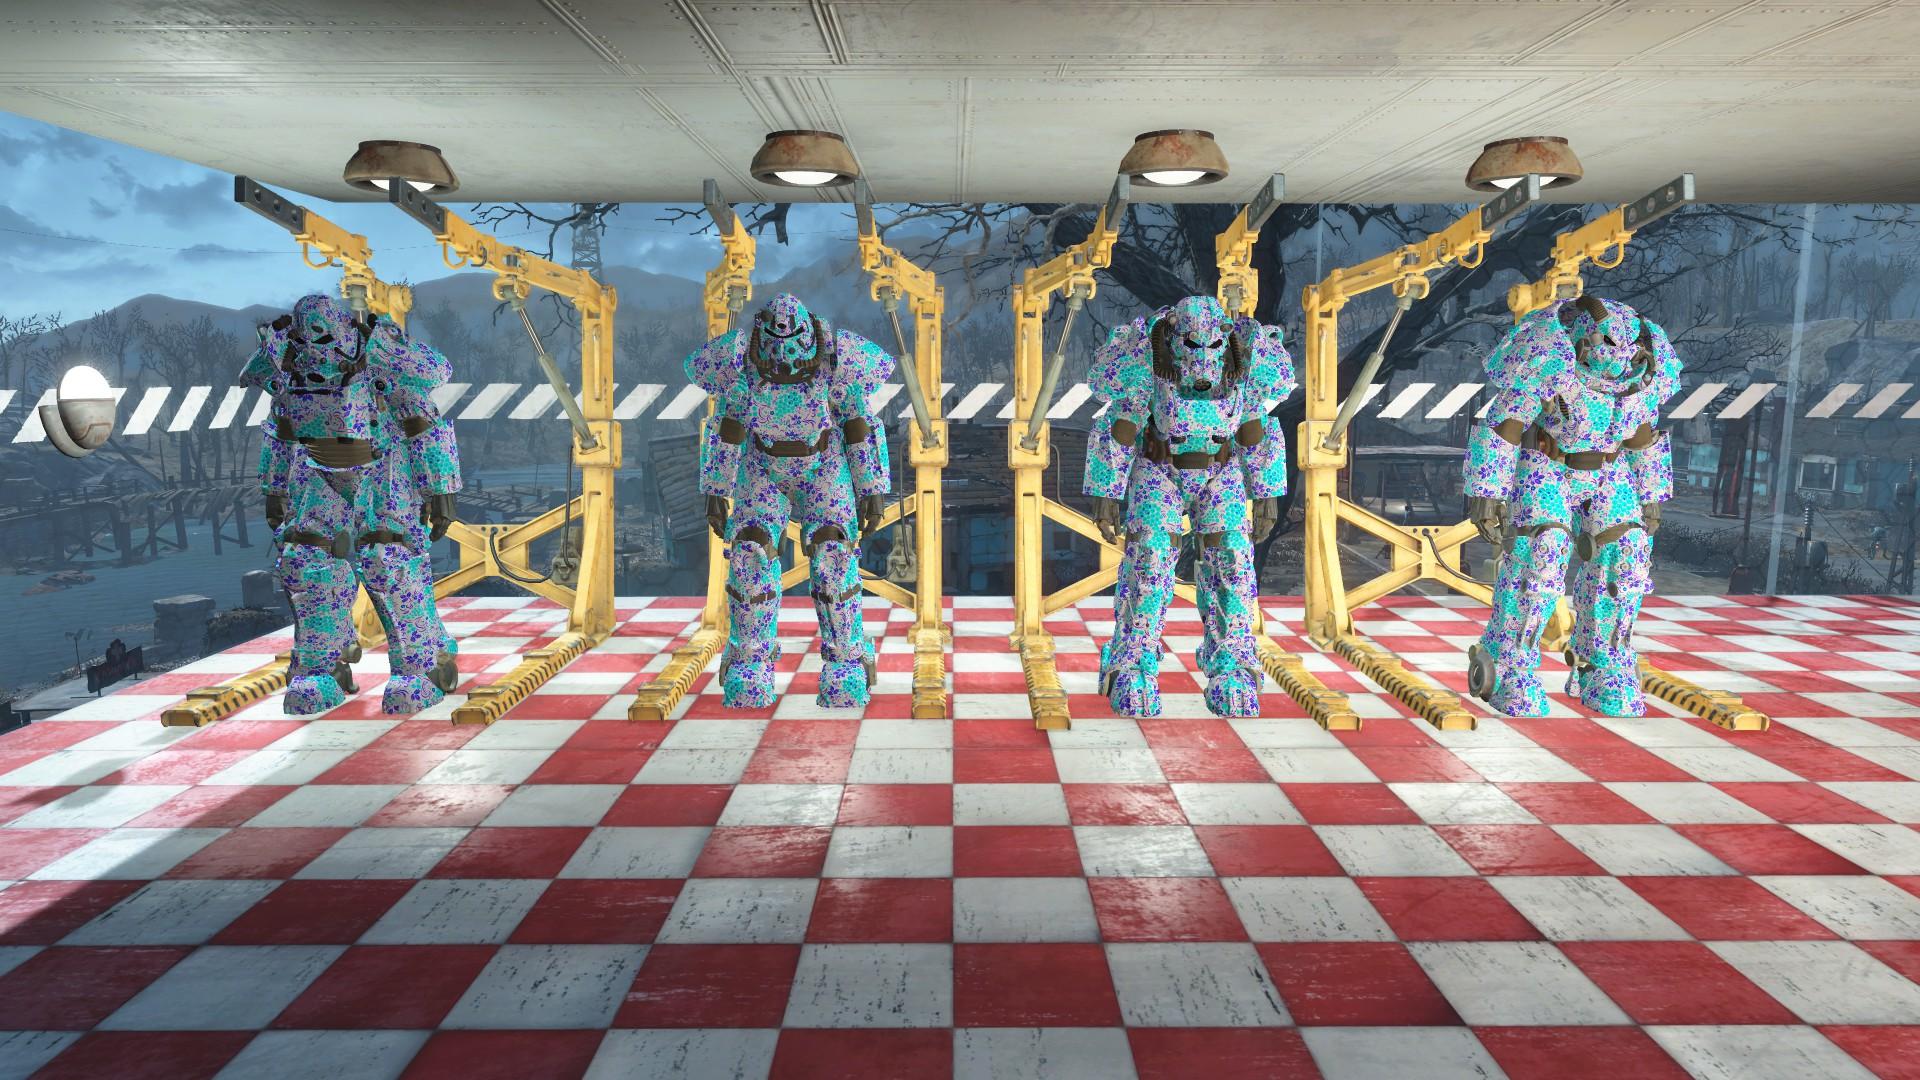 20190406153436_1.jpg - Fallout 4